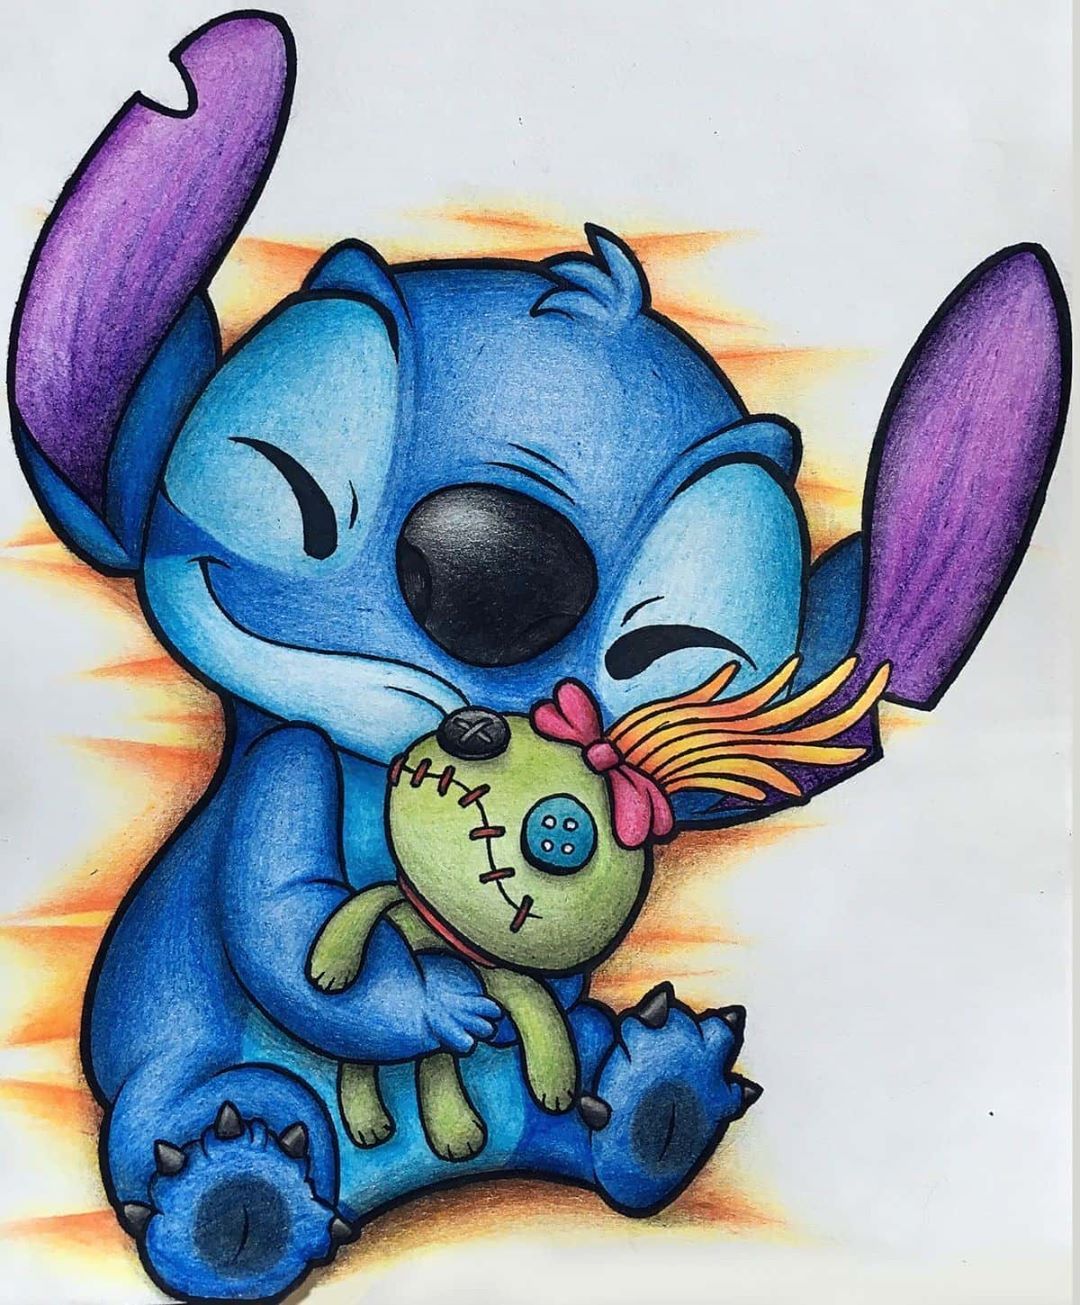 Lilst S Instagram Profile Post Stitch Lilostitch Liloandstitch Lovestitch Loveliloandstitch In 2020 Lilo And Stitch Drawings Stitch Drawing Disney Drawings